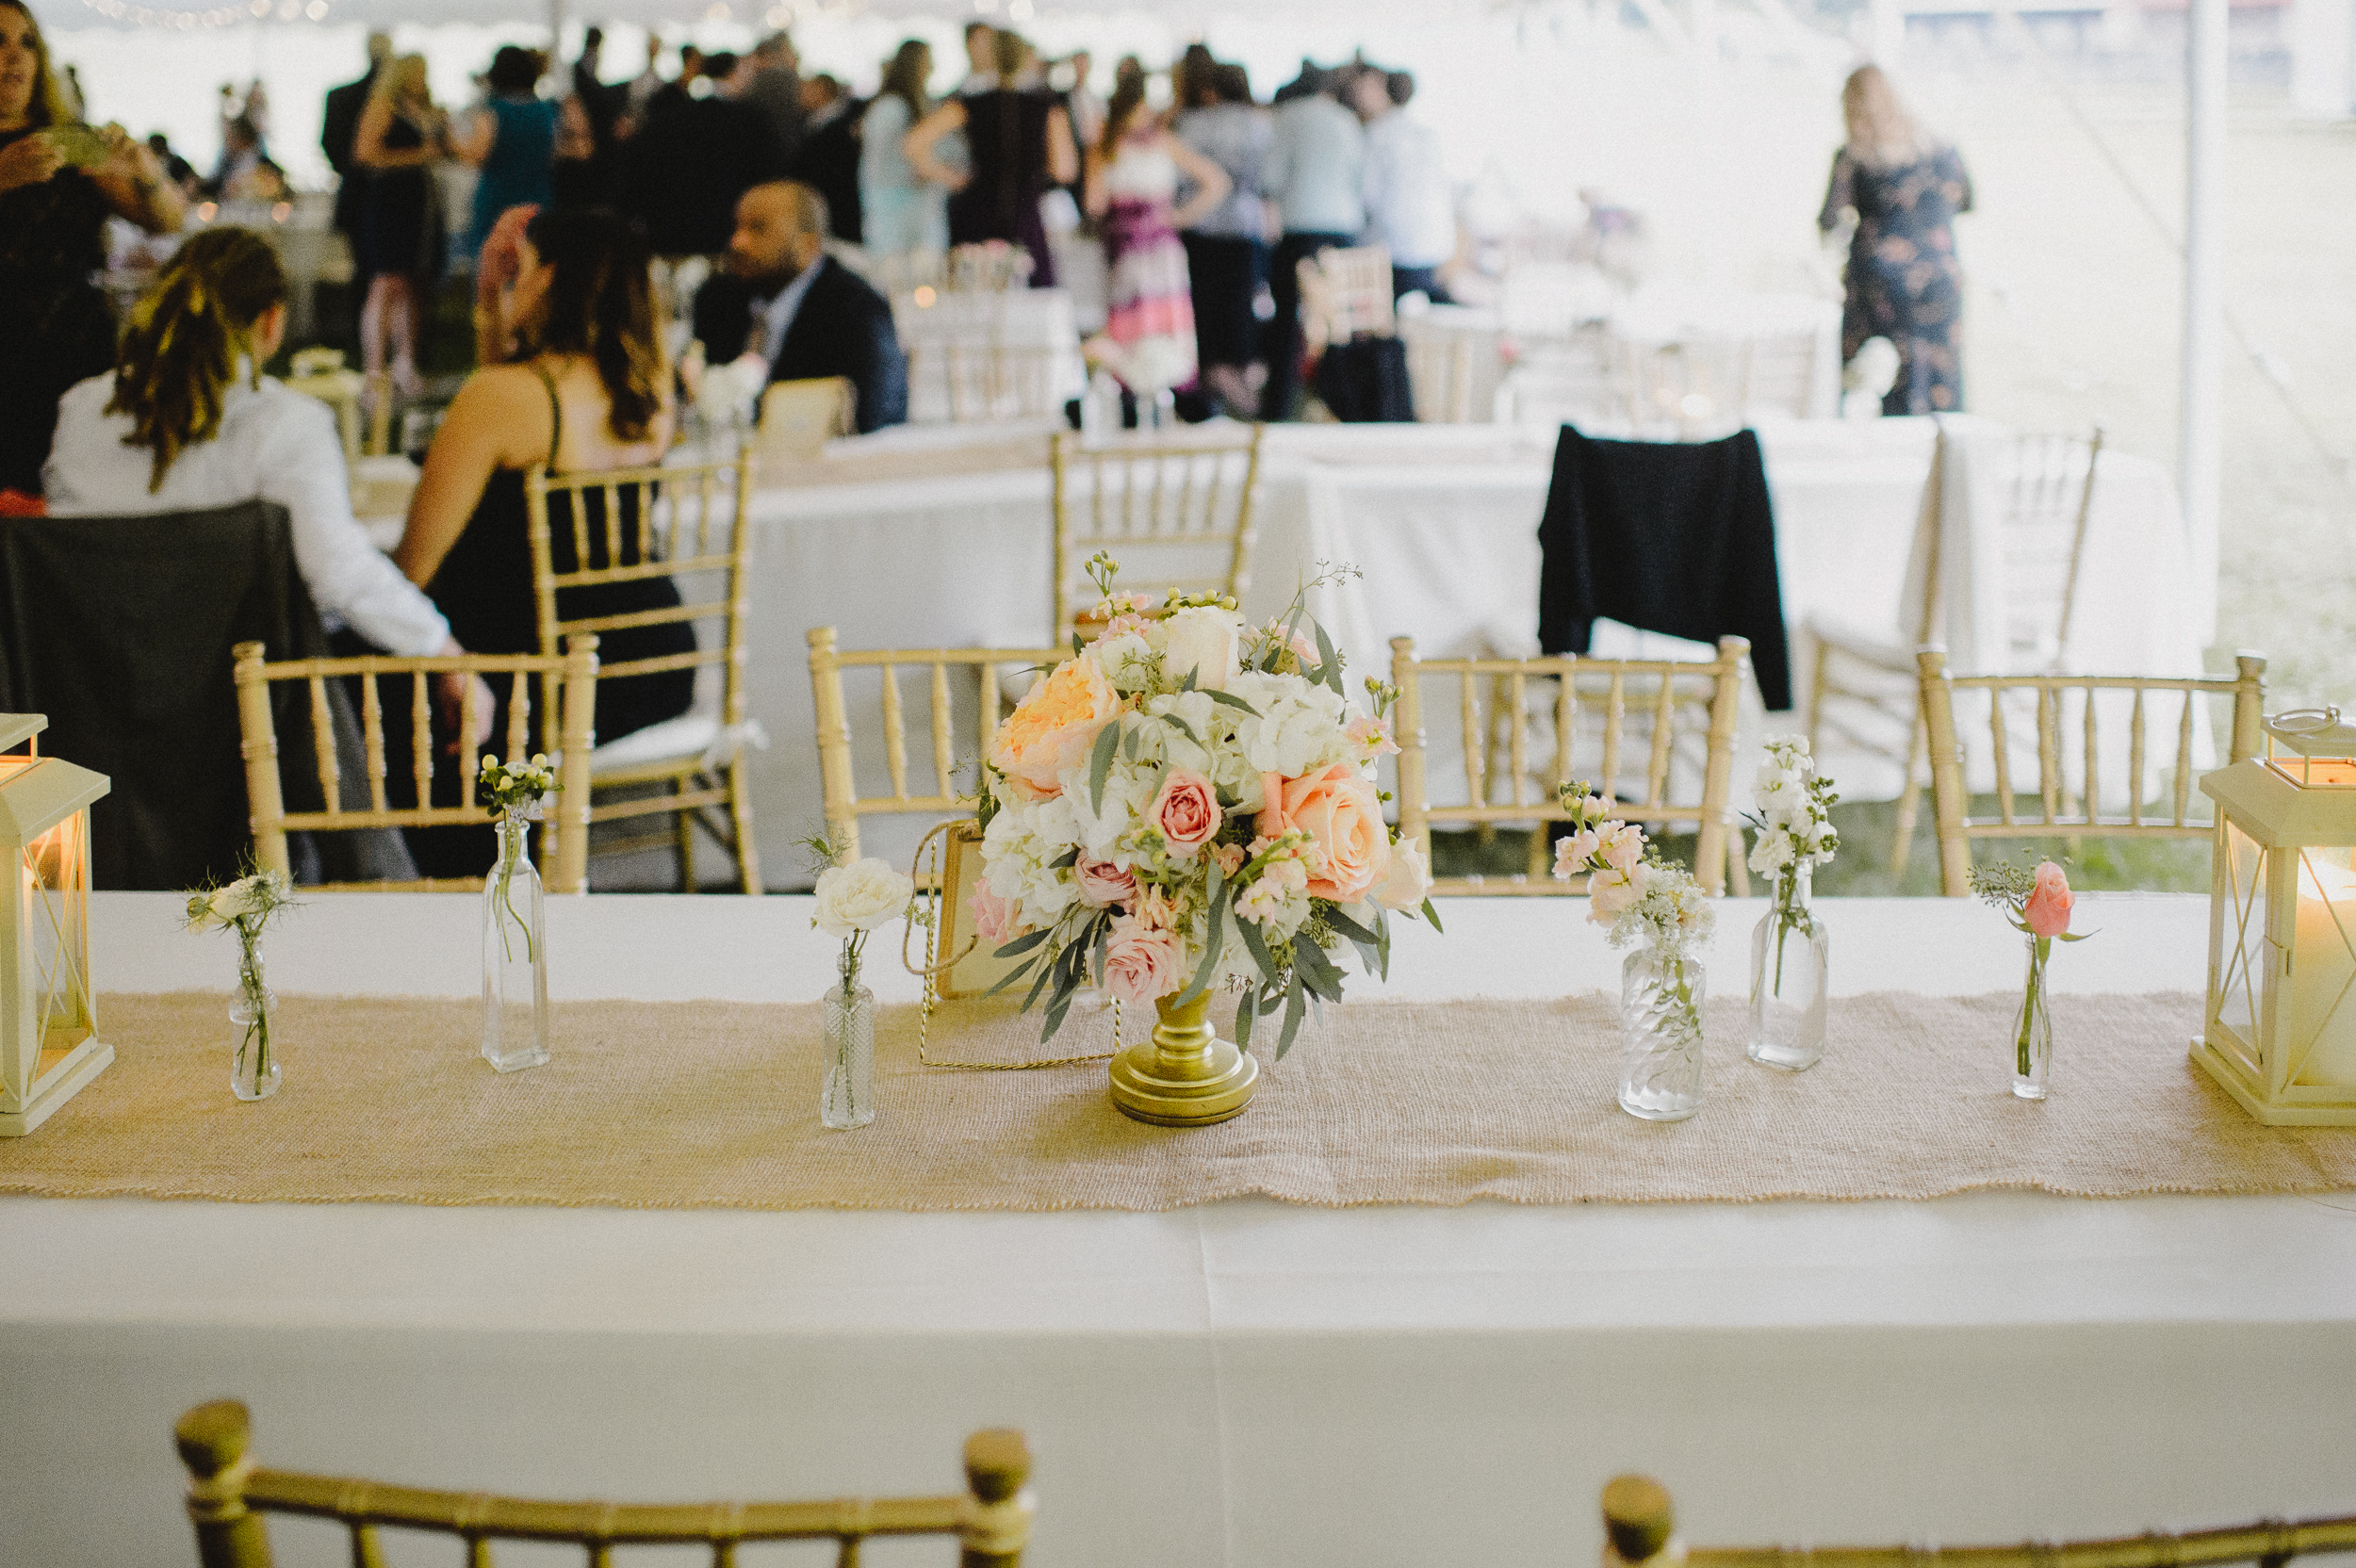 delaware-estate-wedding-photographer-pat-robinson-photography-70.jpg